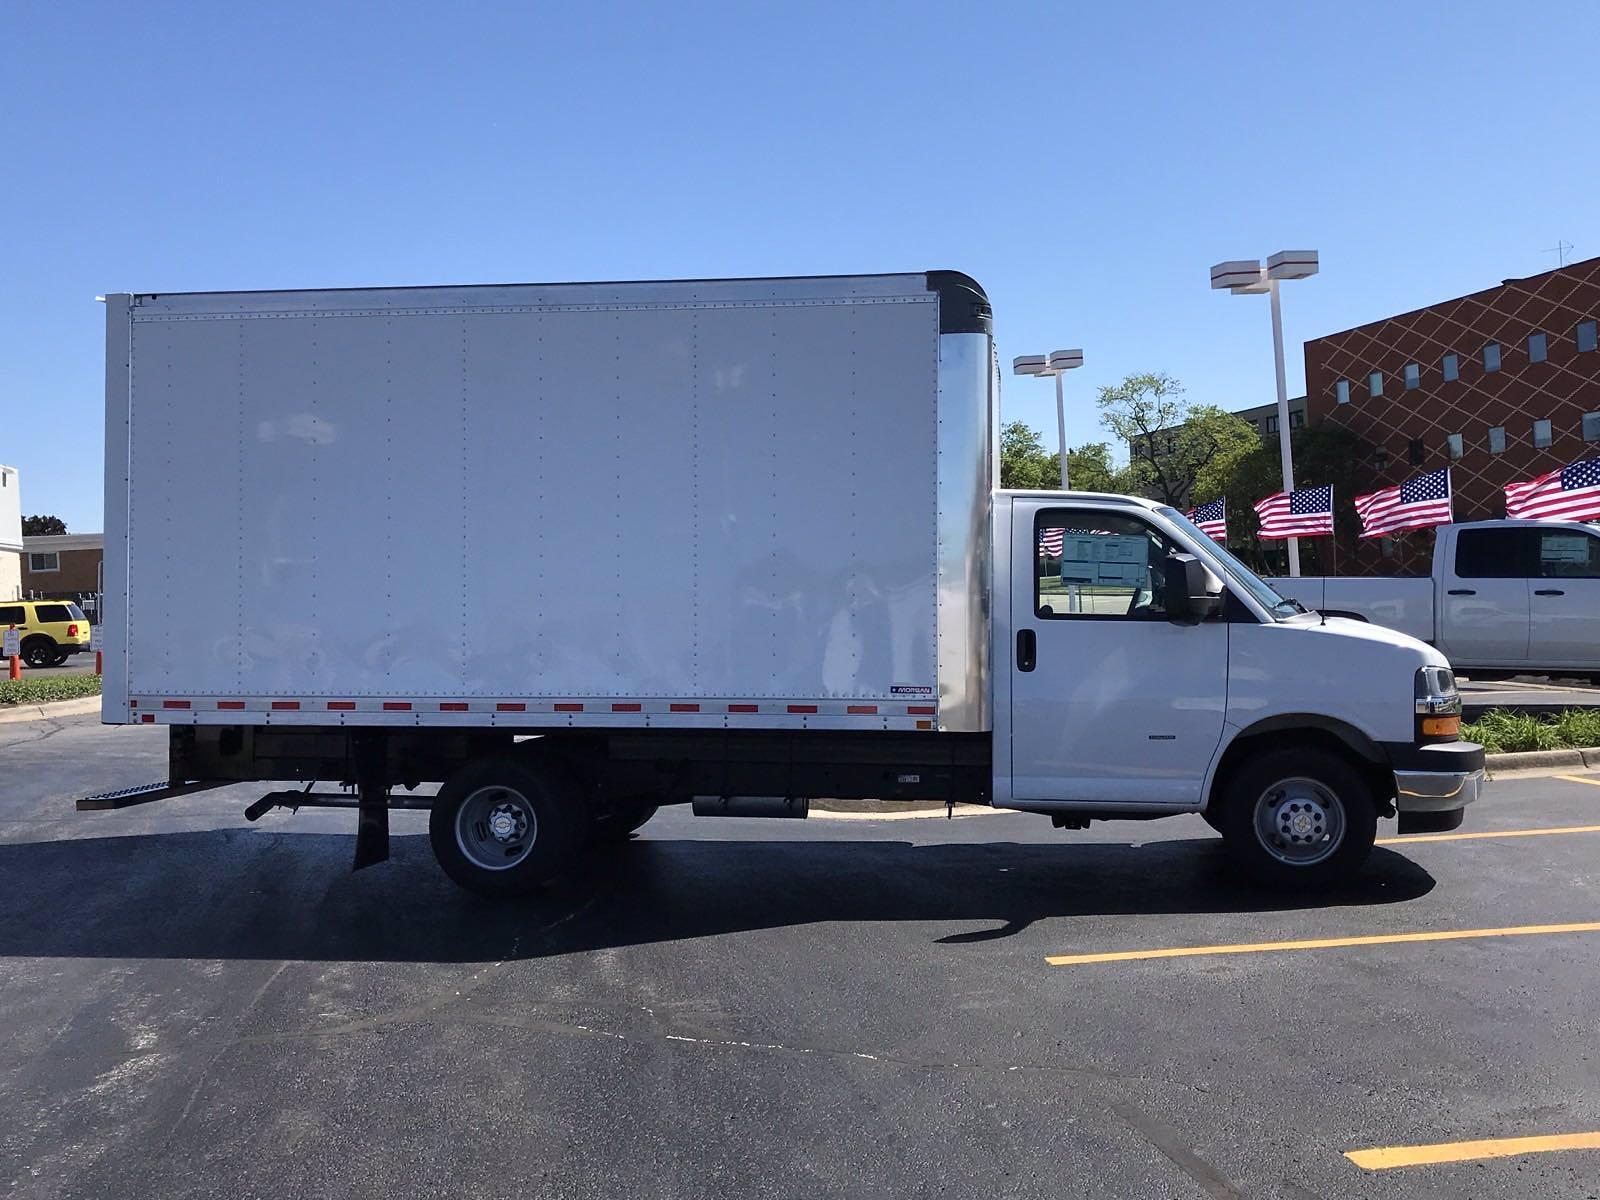 2021 Chevrolet Express 3500 4x2, Cutaway Van #B28009 - photo 3